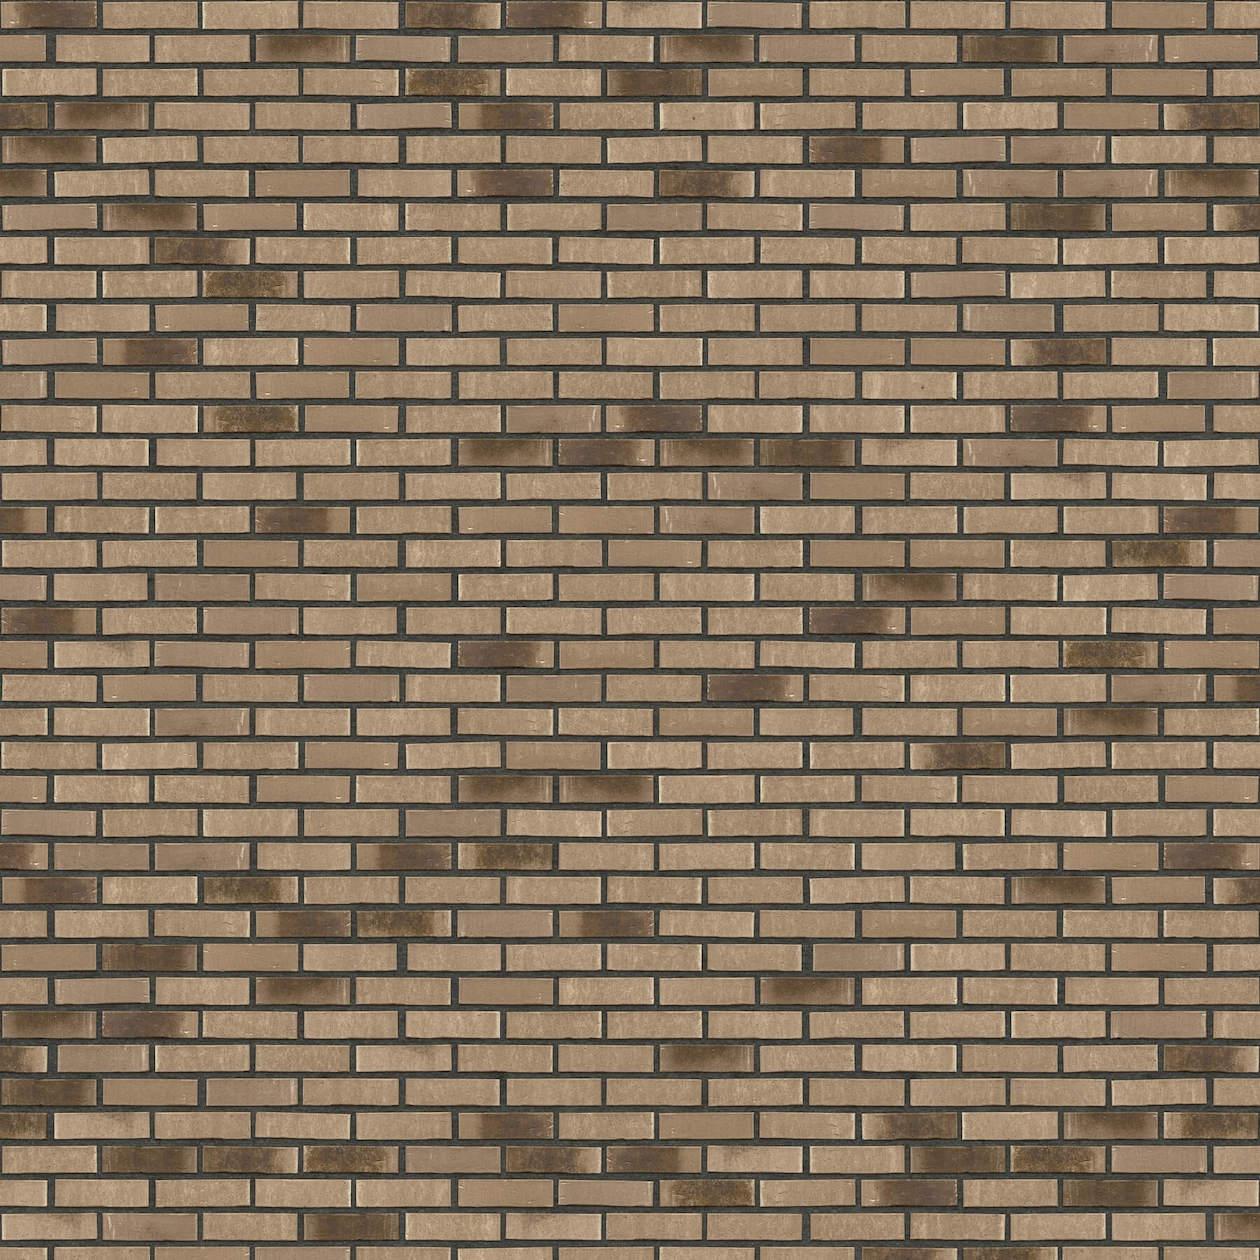 Puna-cigla-FeldHaus-Klinker-brick-house-nf-k-764-Antracit Fuga